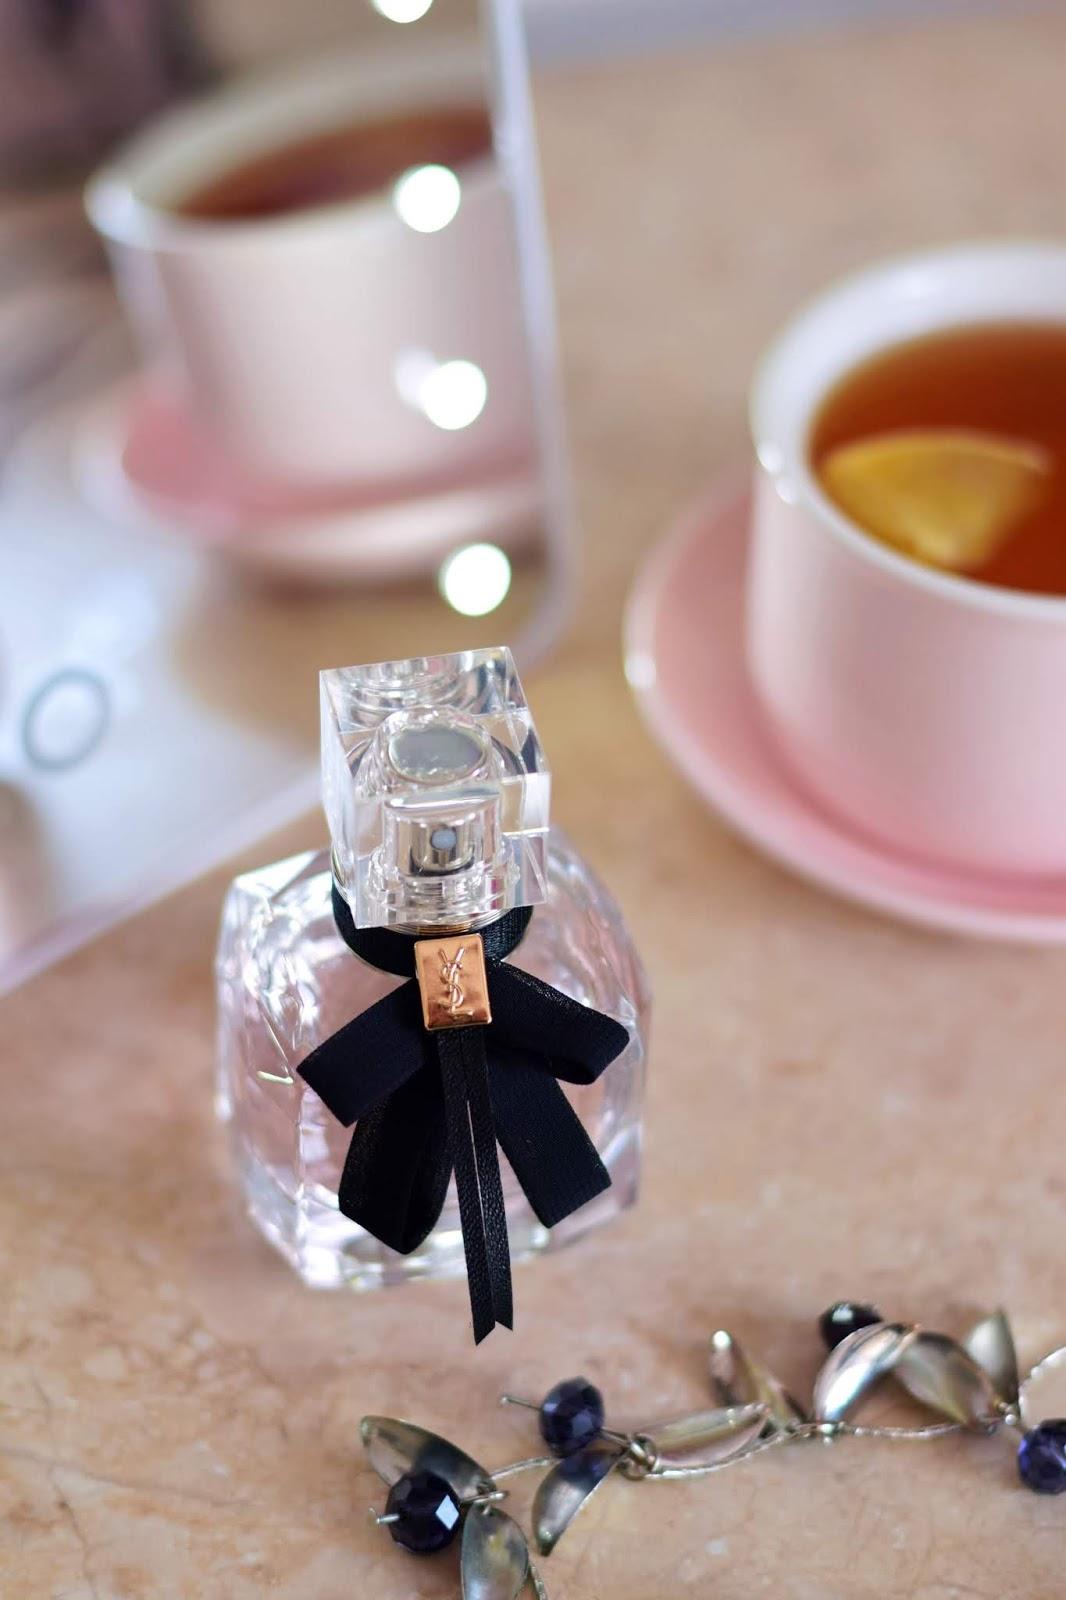 yves_saint_laurent_mon_paris_recenzja_blog_opinia_zapach_kwiatowy